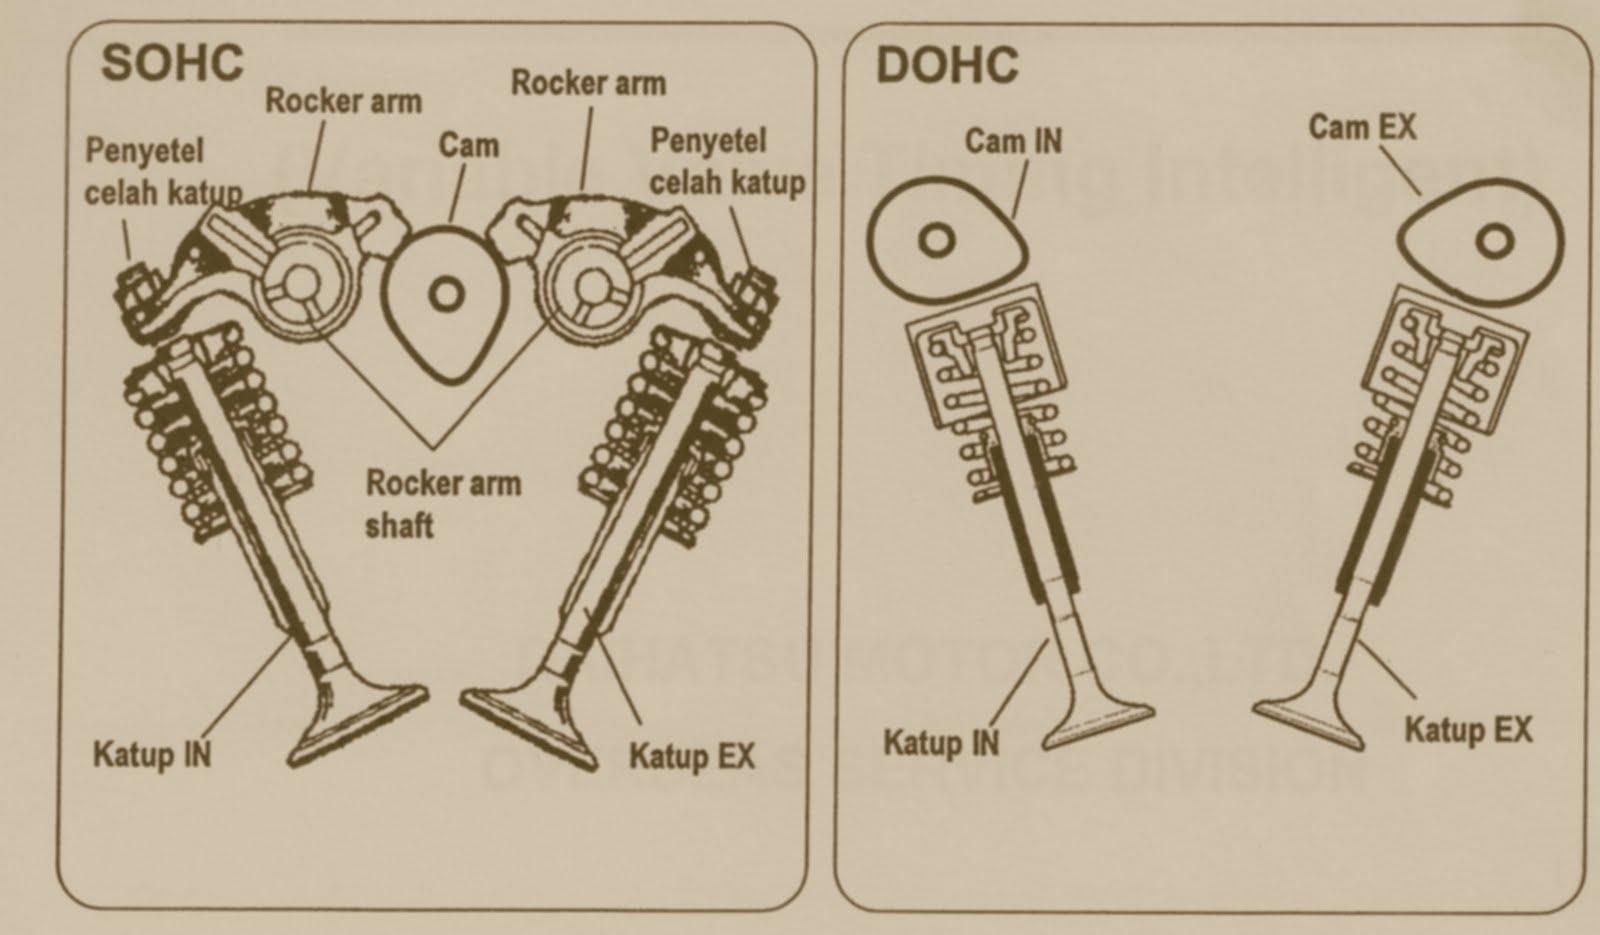 dohc2